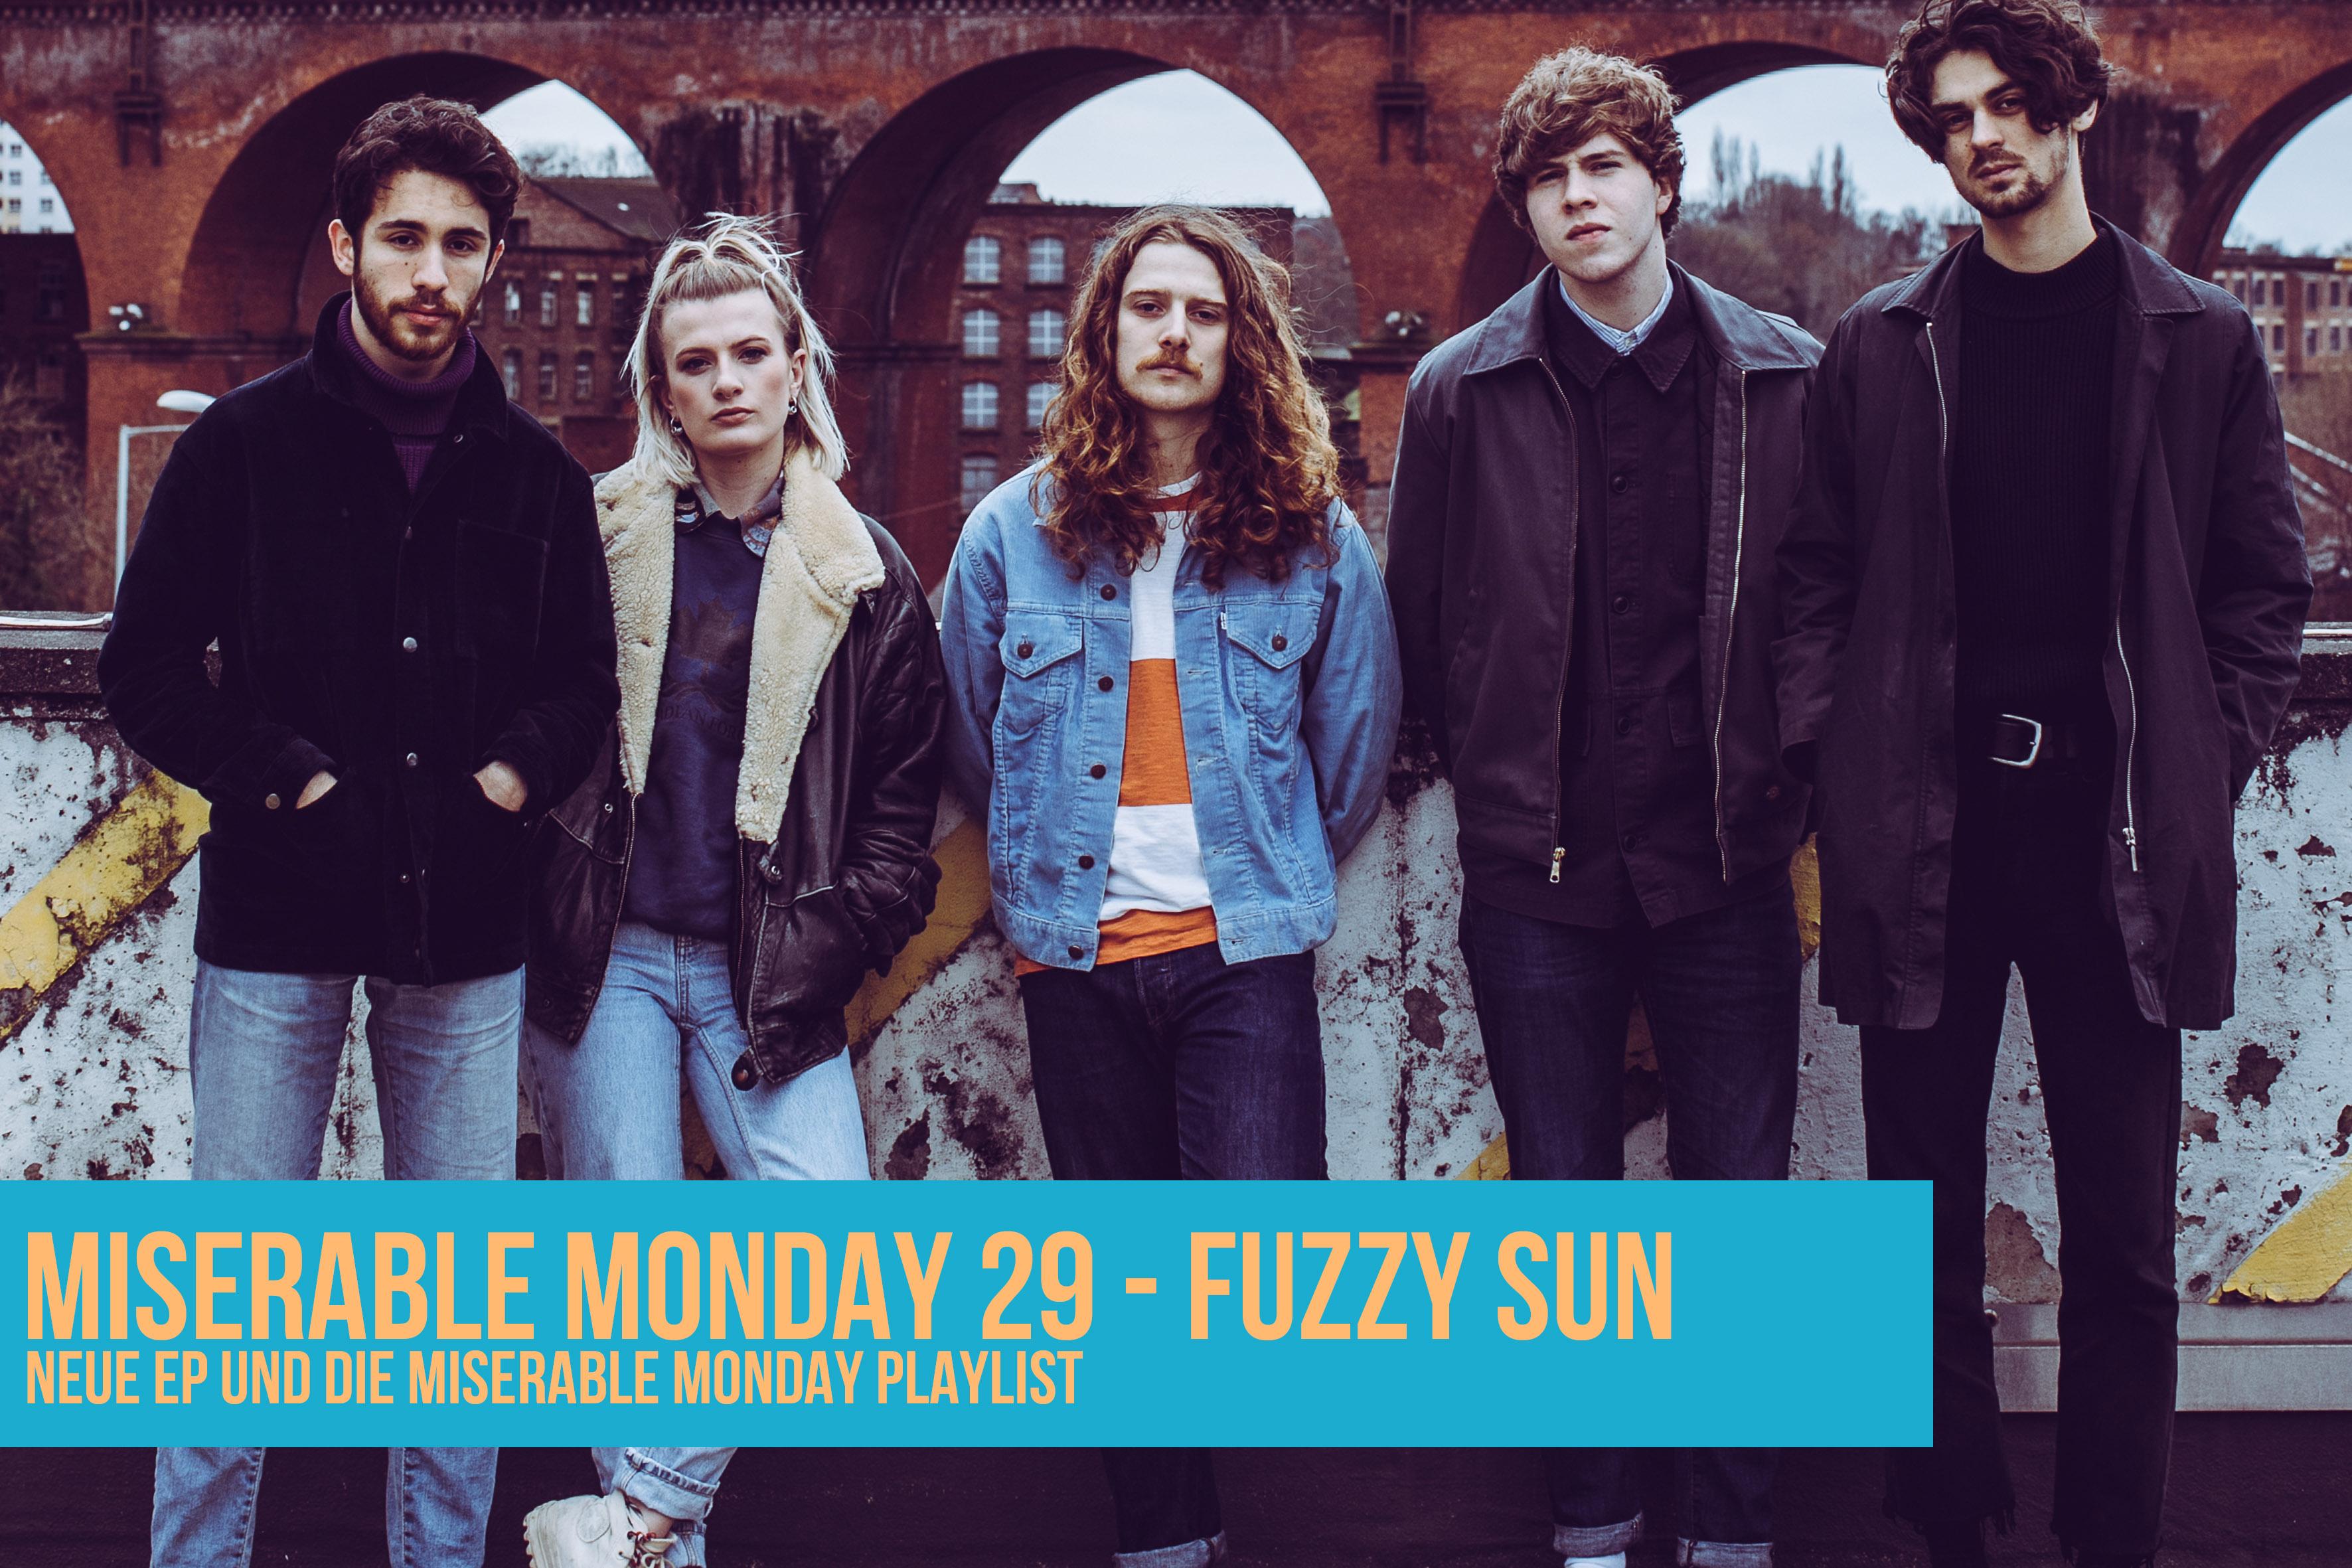 029 - Fuzzy Sun